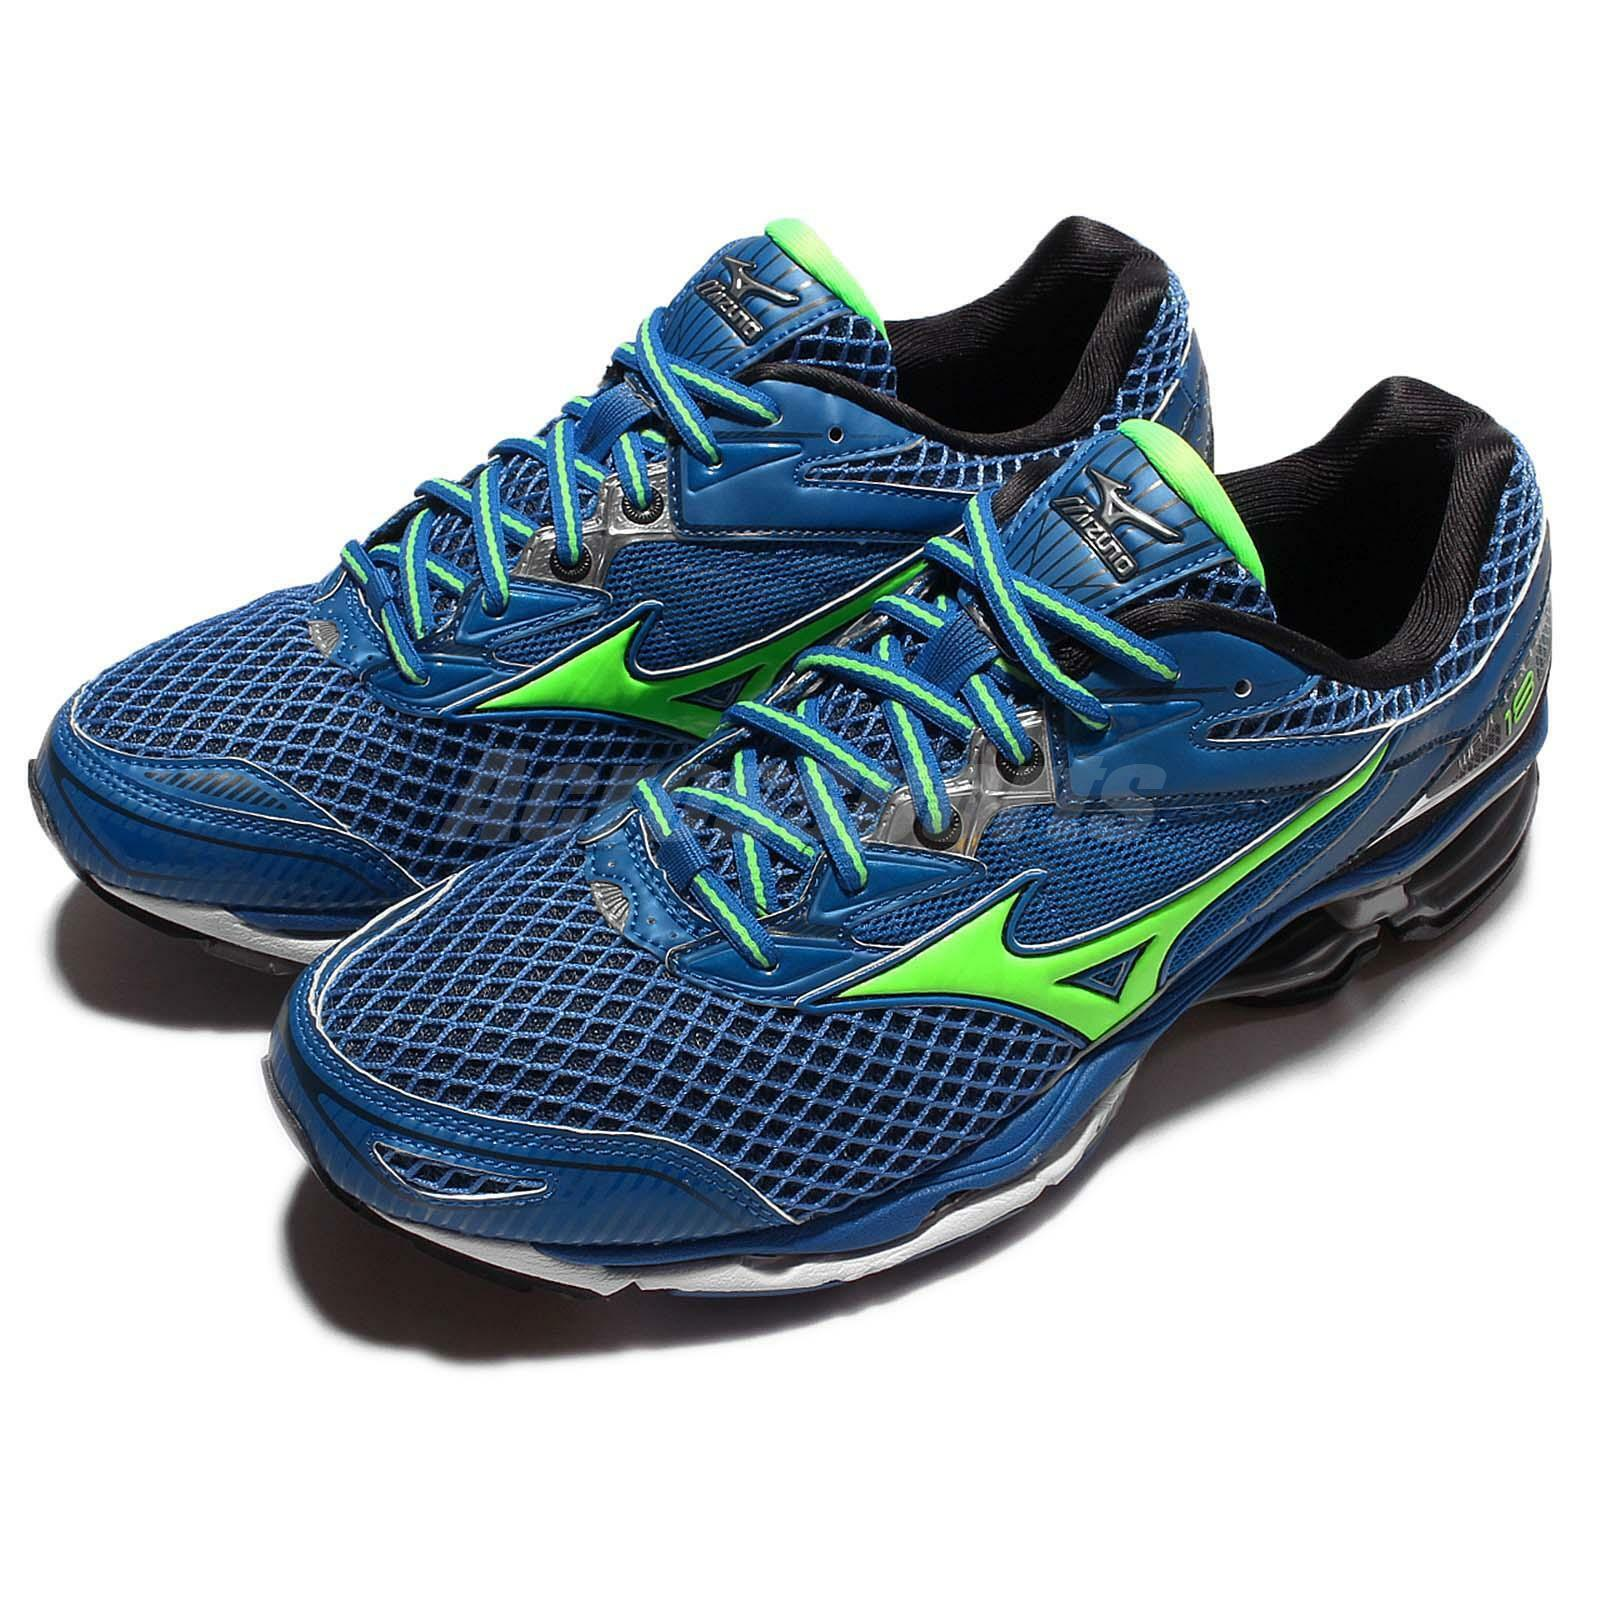 Mizuno Wave Creation 18 Blue Green Sprite Men Running Shoes Sneakers J1GC1601-41